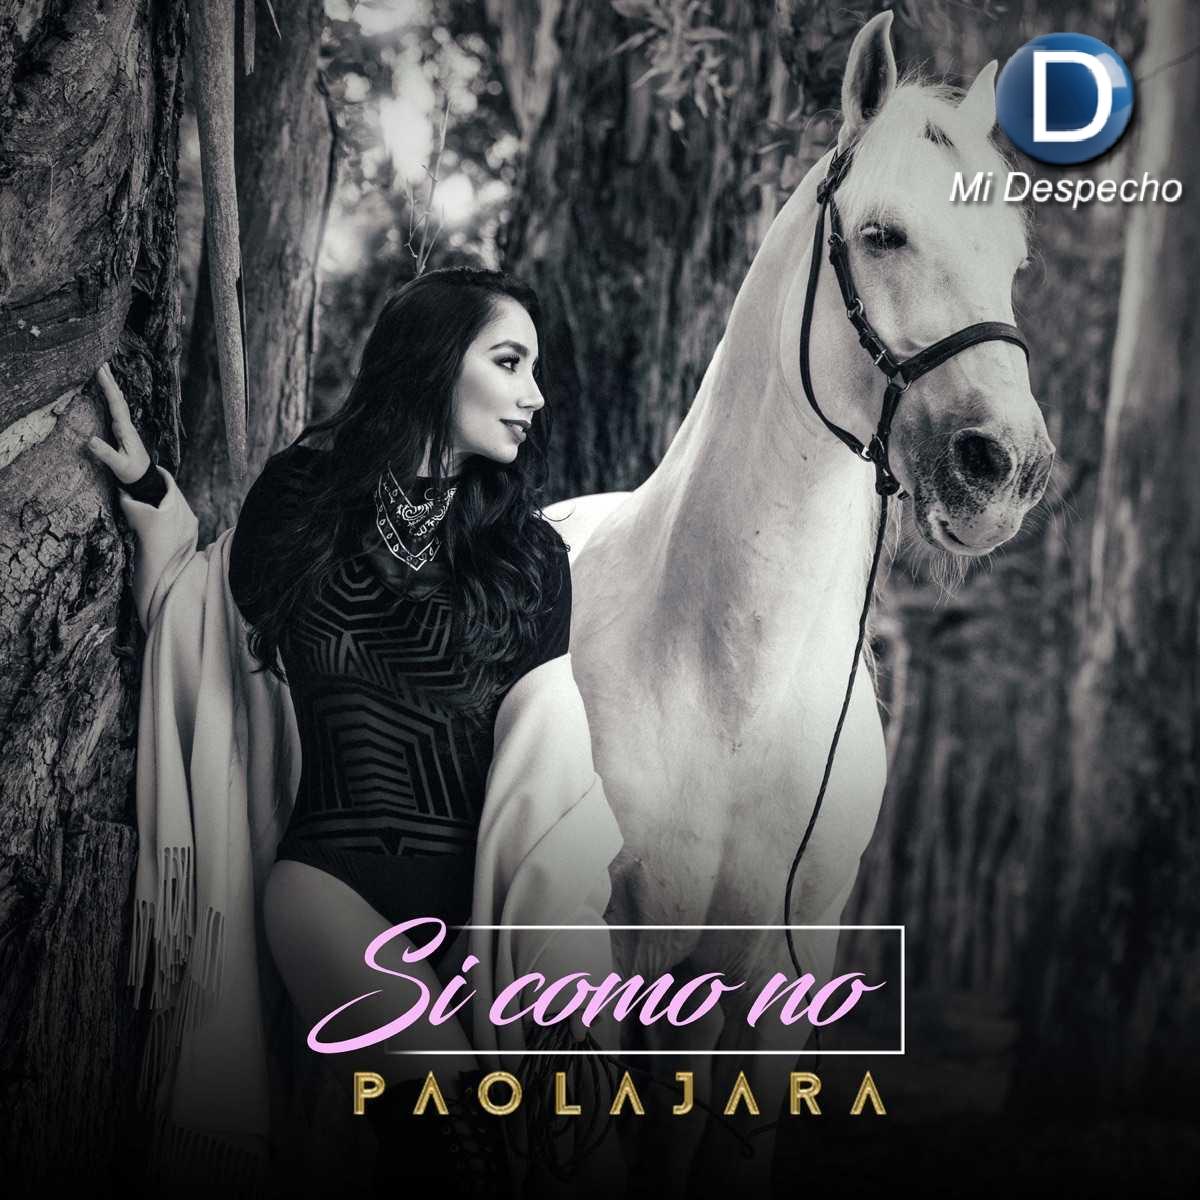 Paola Jara Si Como No Frontal